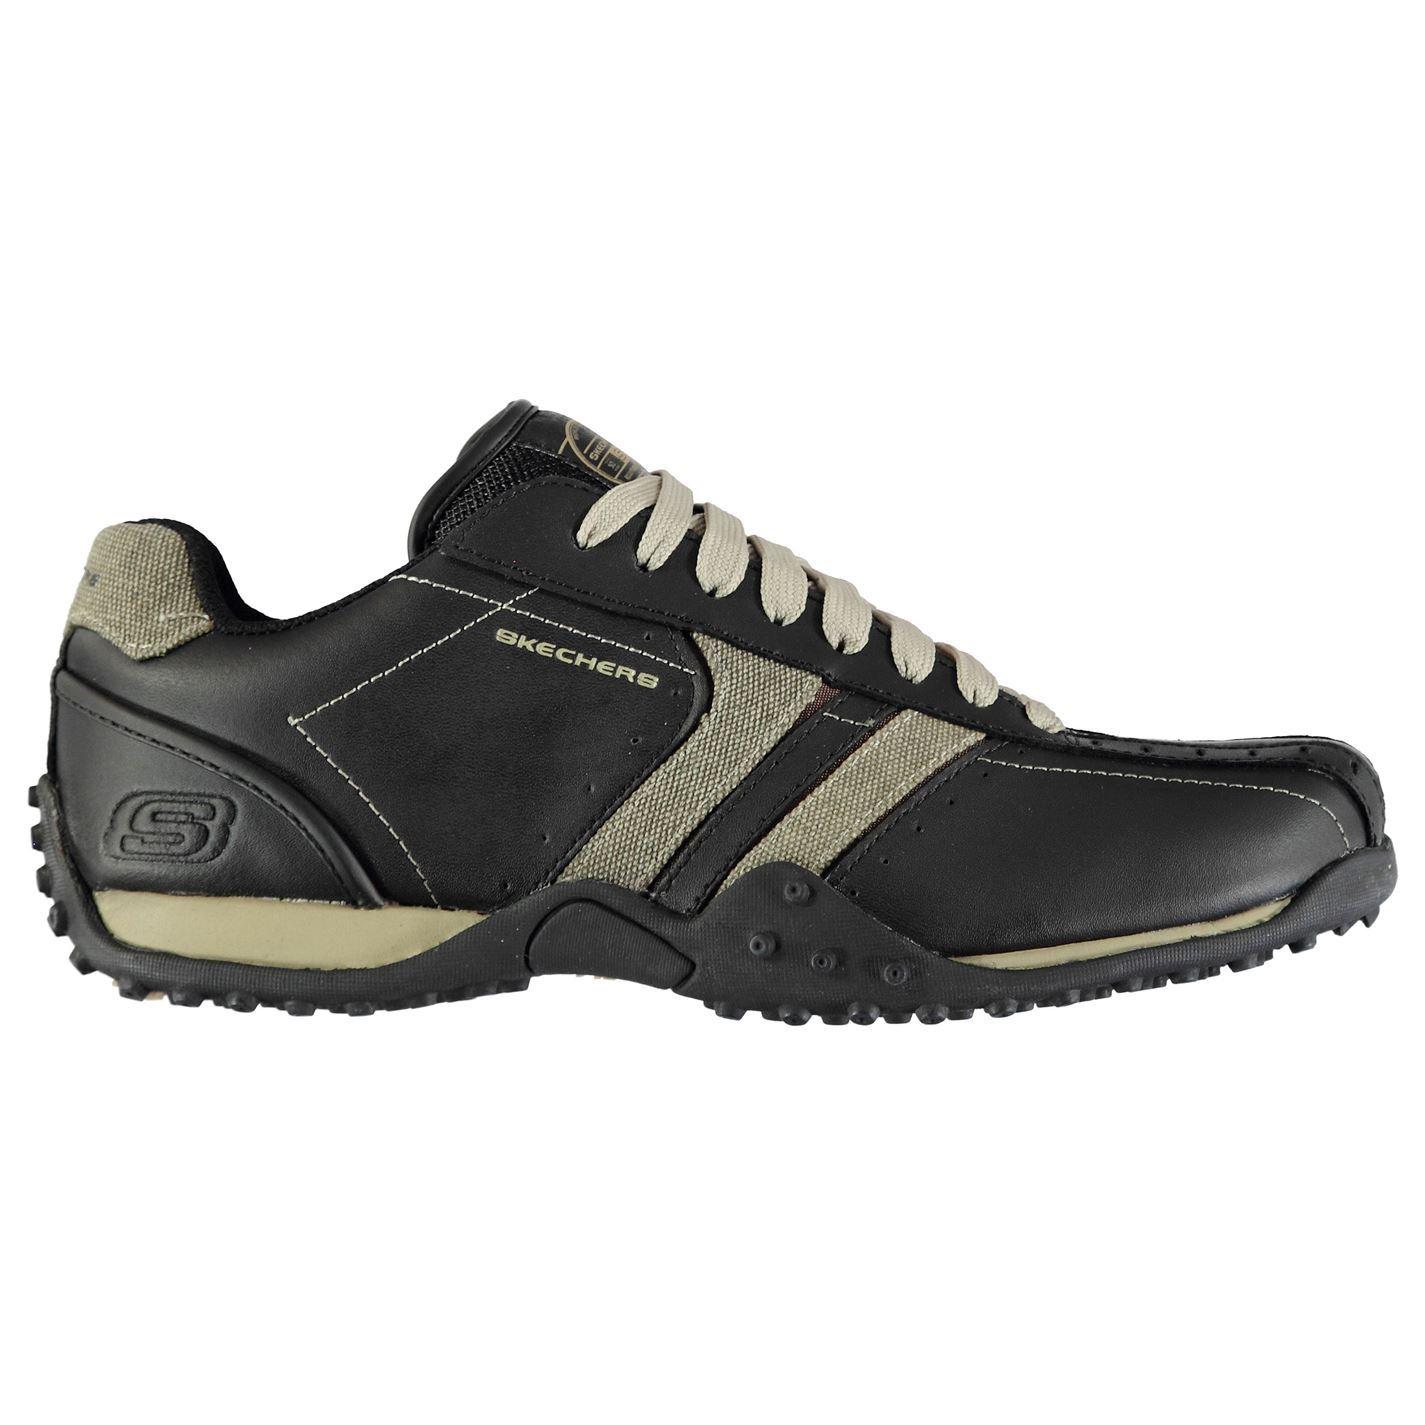 Skechers-Urban-Track-Forward-Trainers-Mens-Athleisure-Footwear-Shoes-Sneakers thumbnail 10